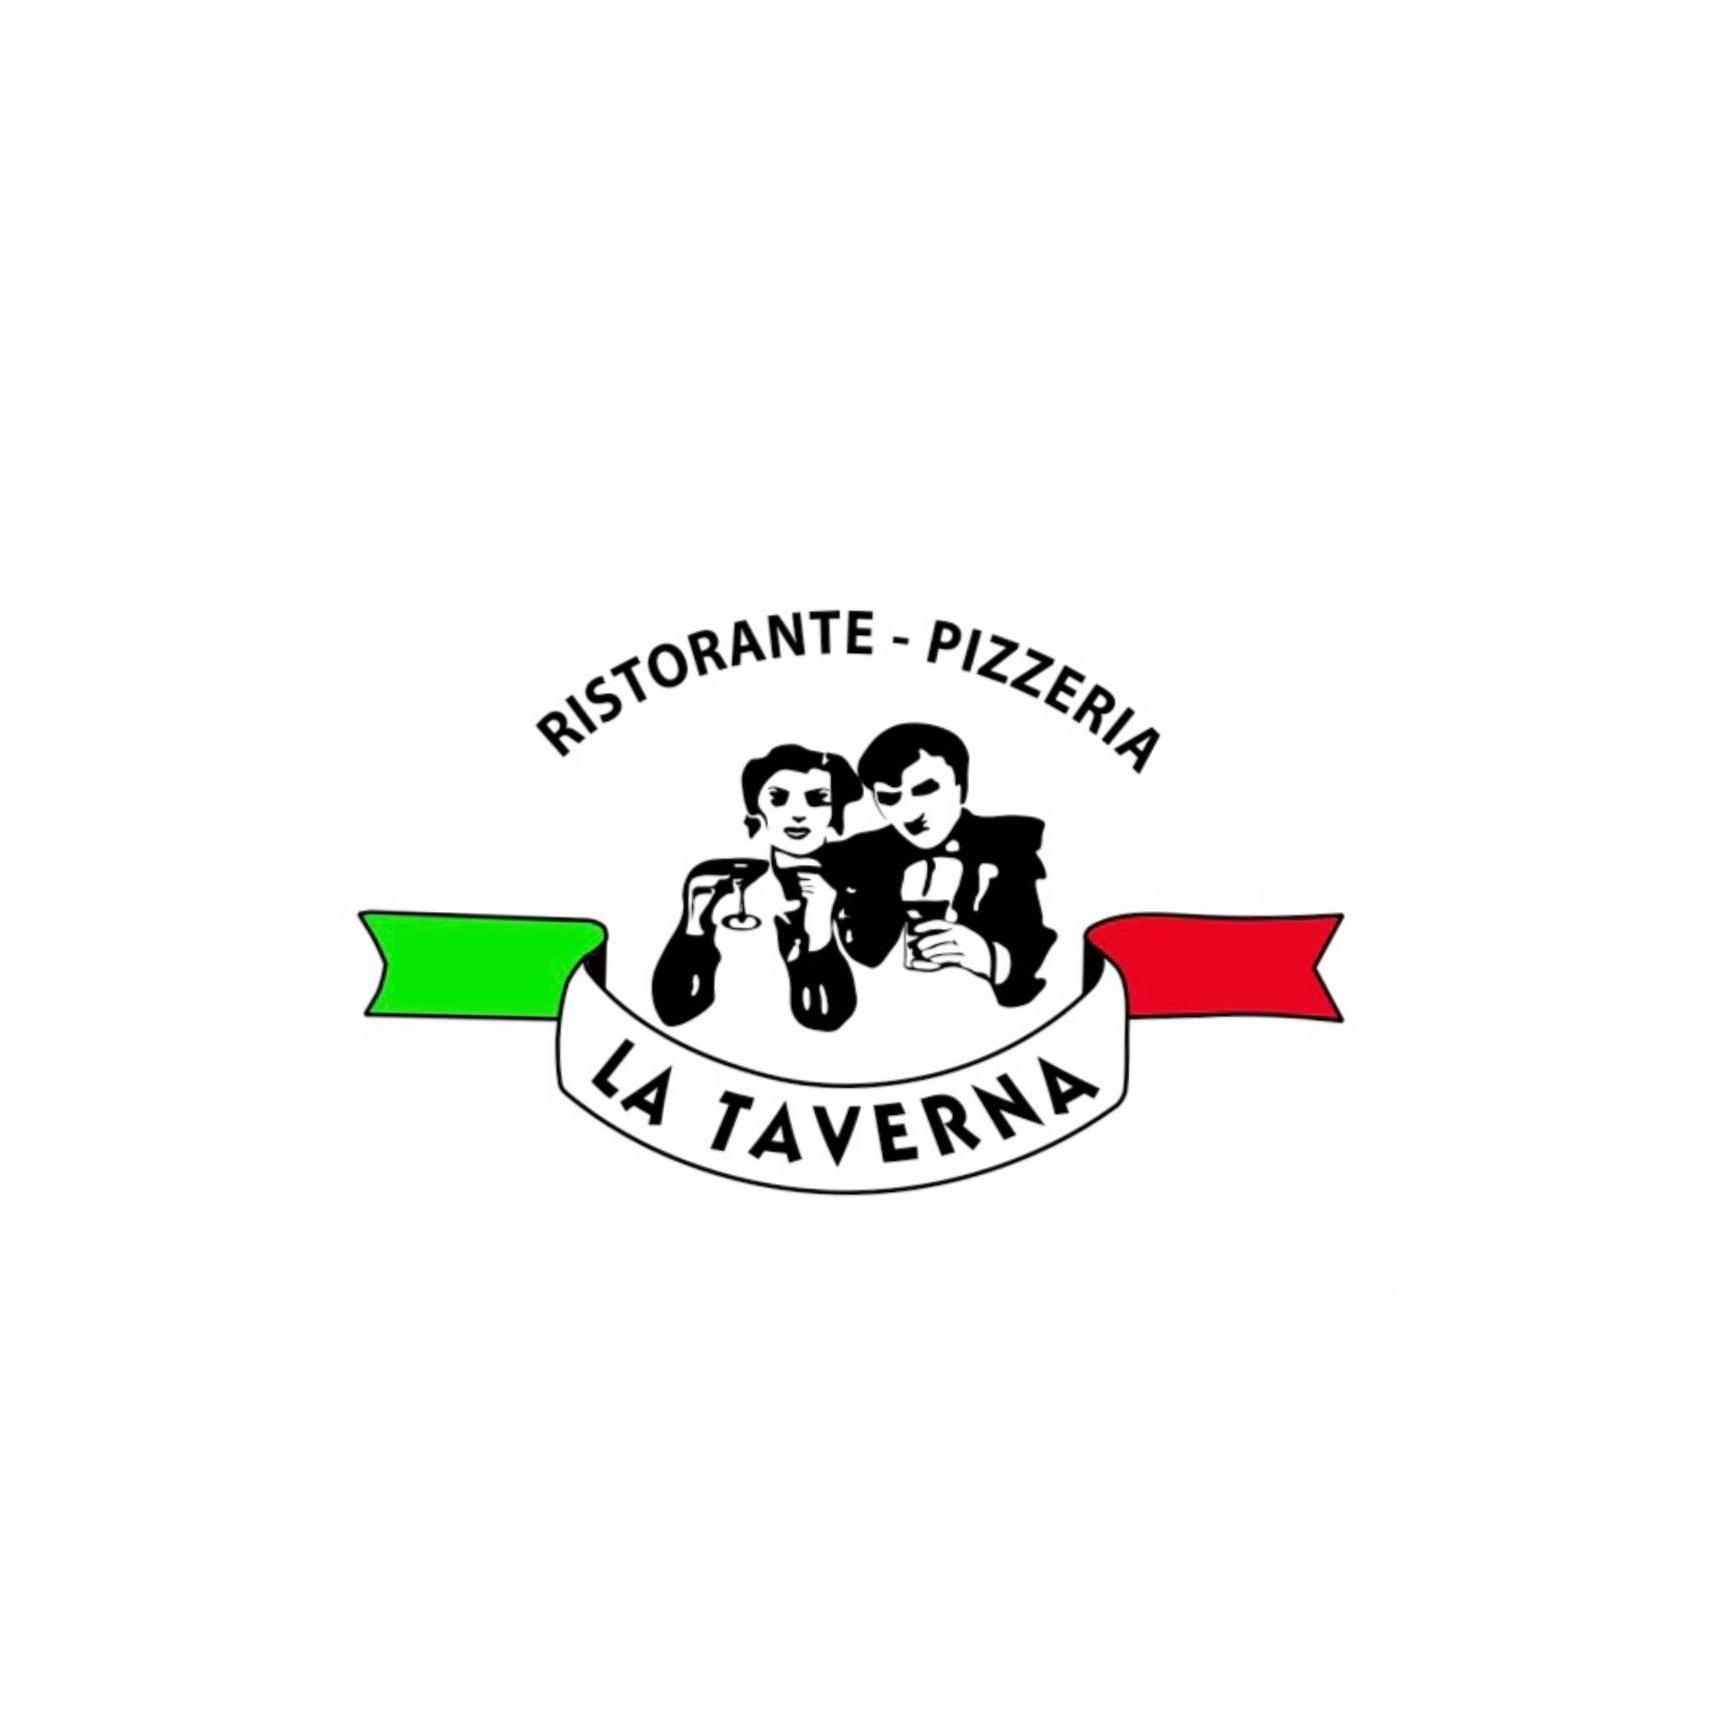 Ristorante - Pizzeria LA TAVERNA